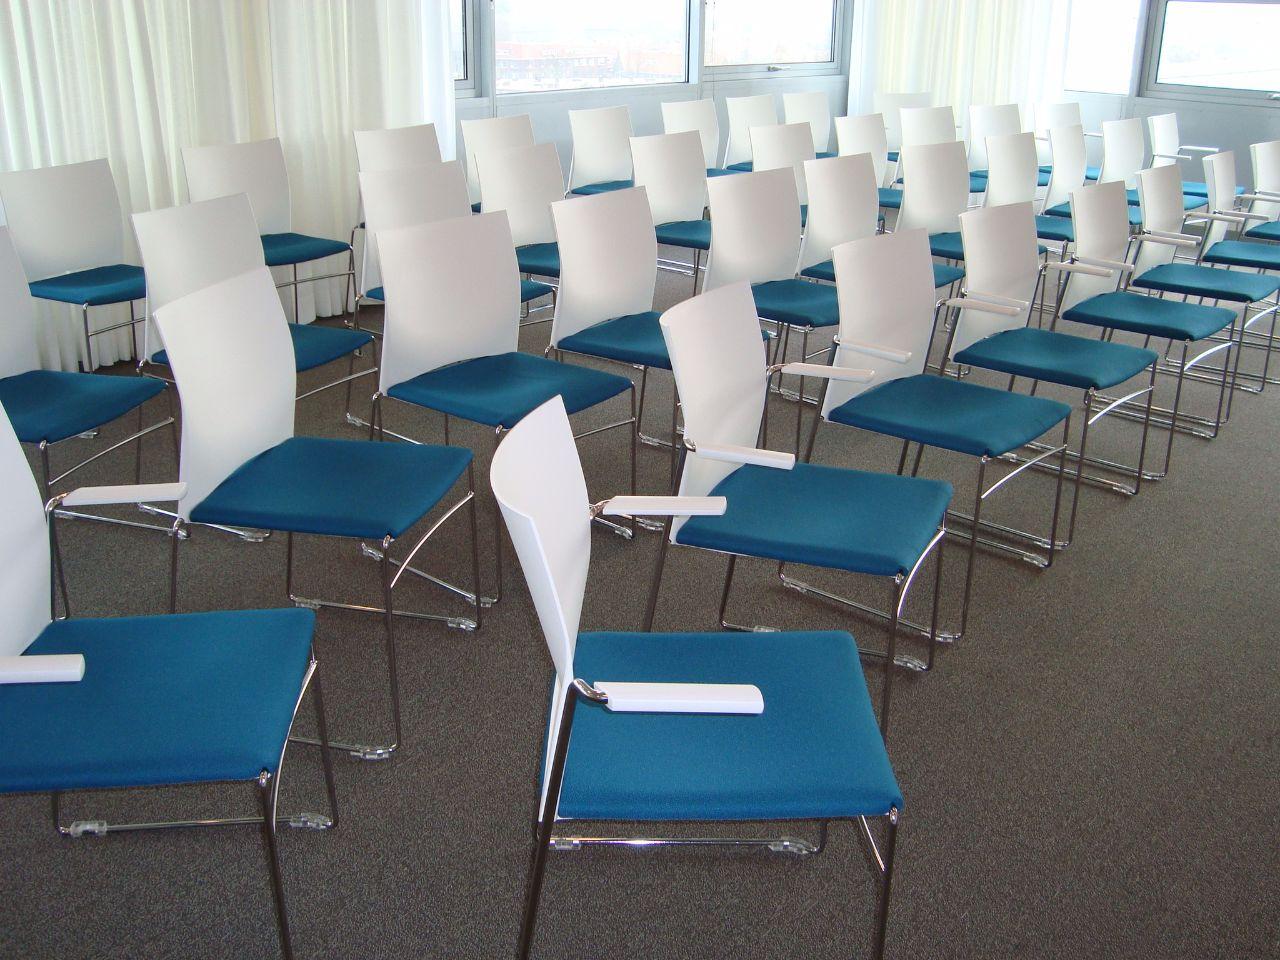 zaalstoel-zaalopstelling-koppelbare-stoel